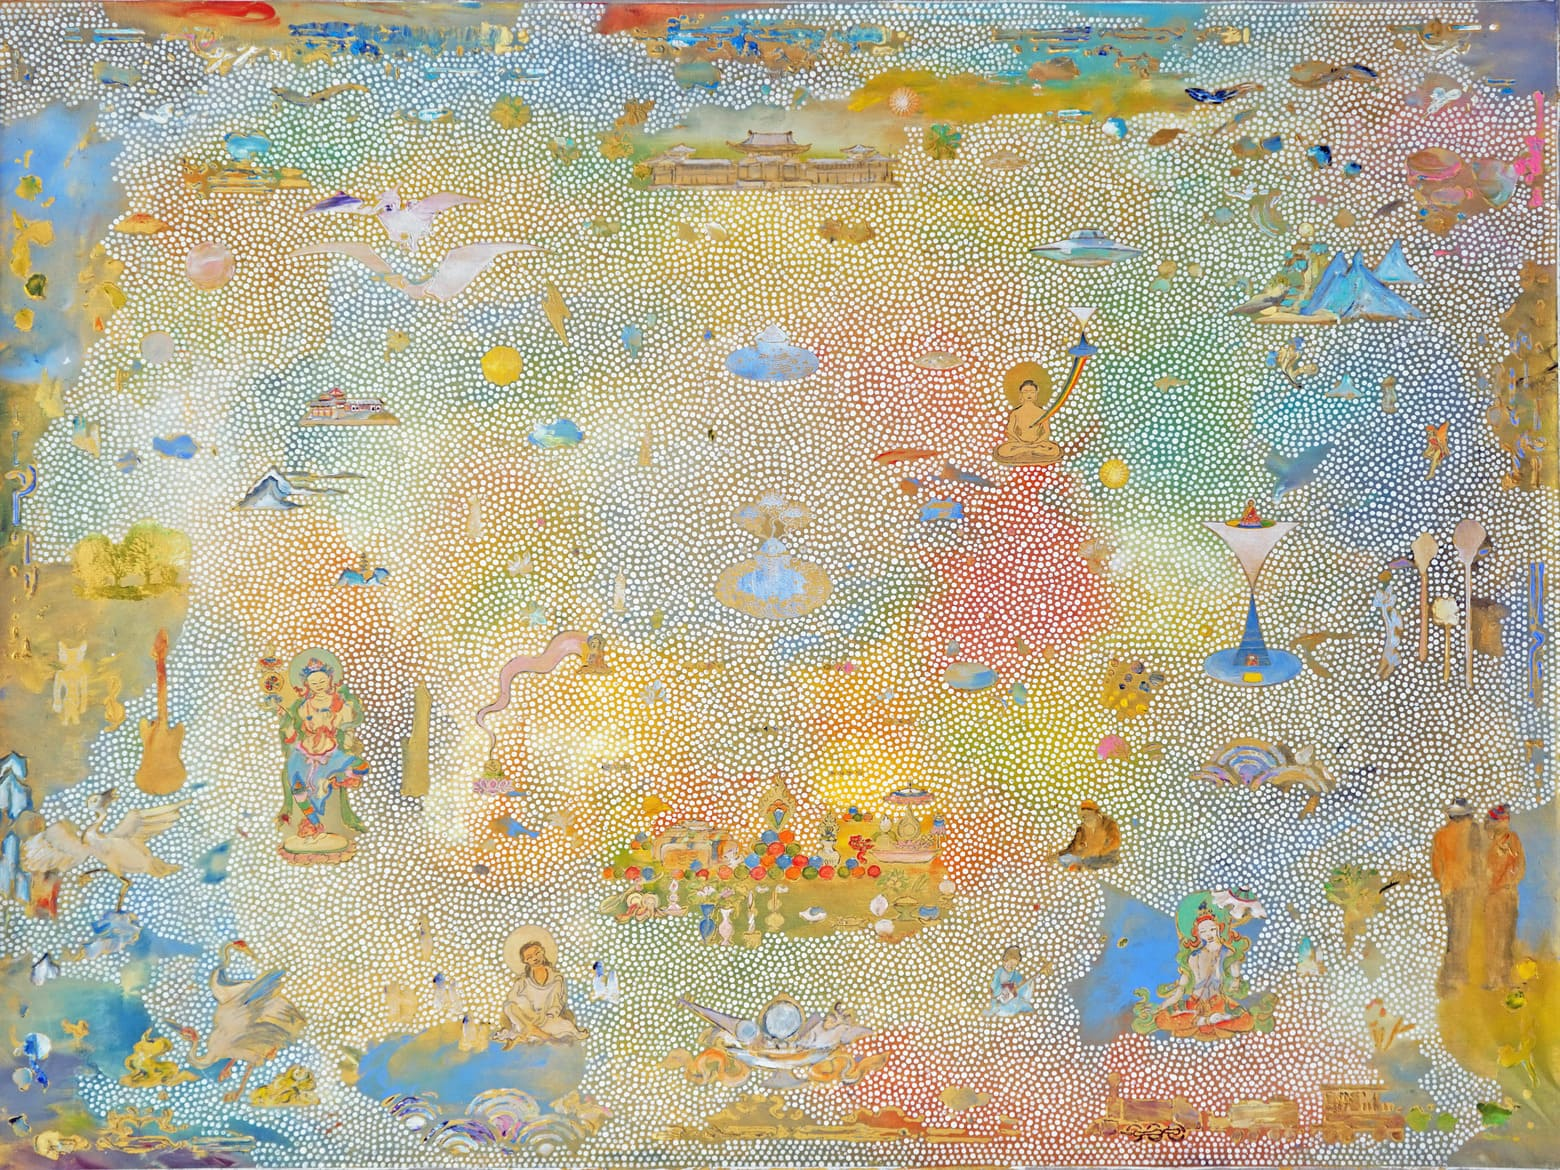 'Approaching Mt Meru', 2017, acrylic on linen, 92 x 122 cm